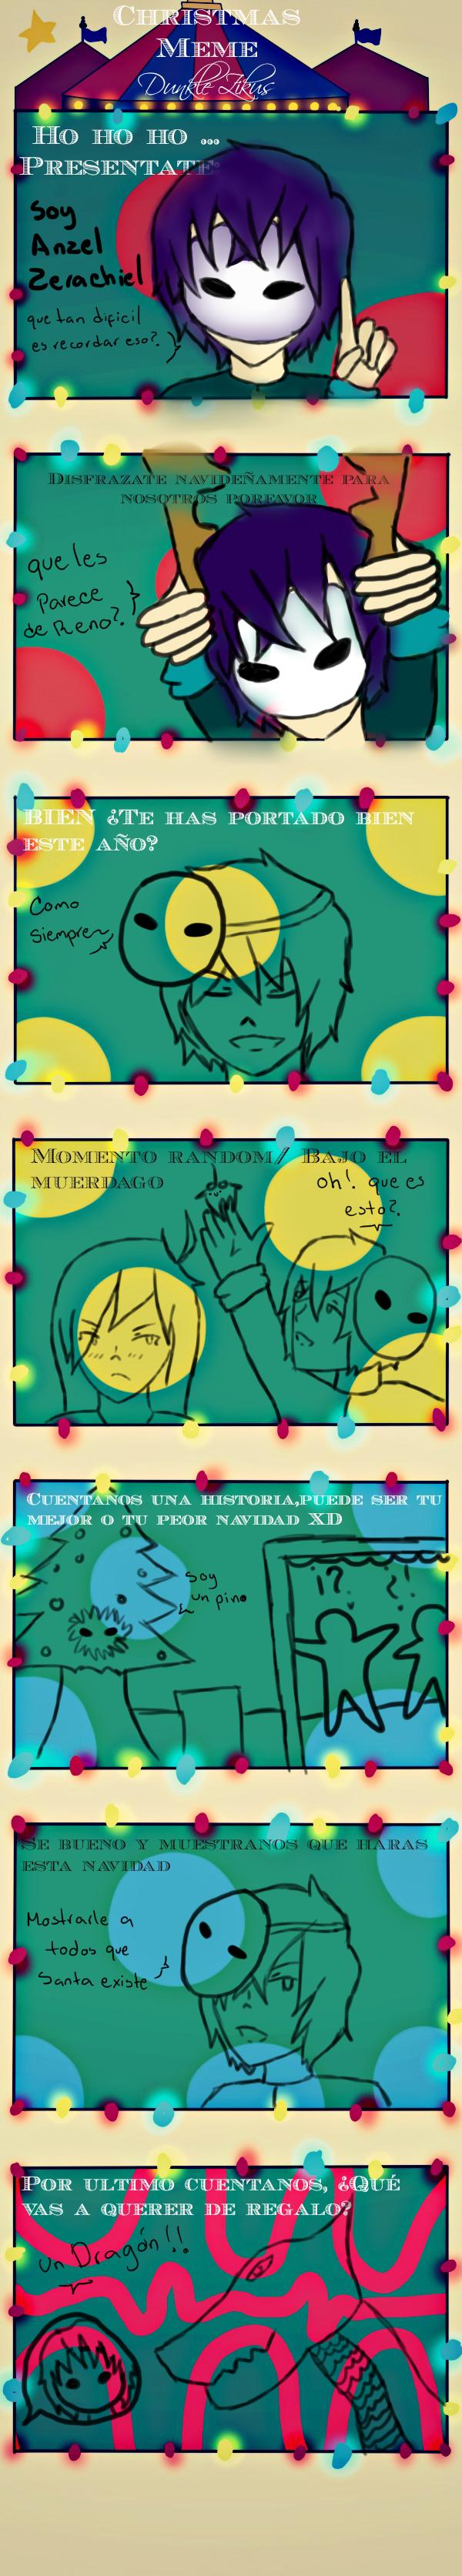 meme navidad Anzel by KaiyaKishimoto